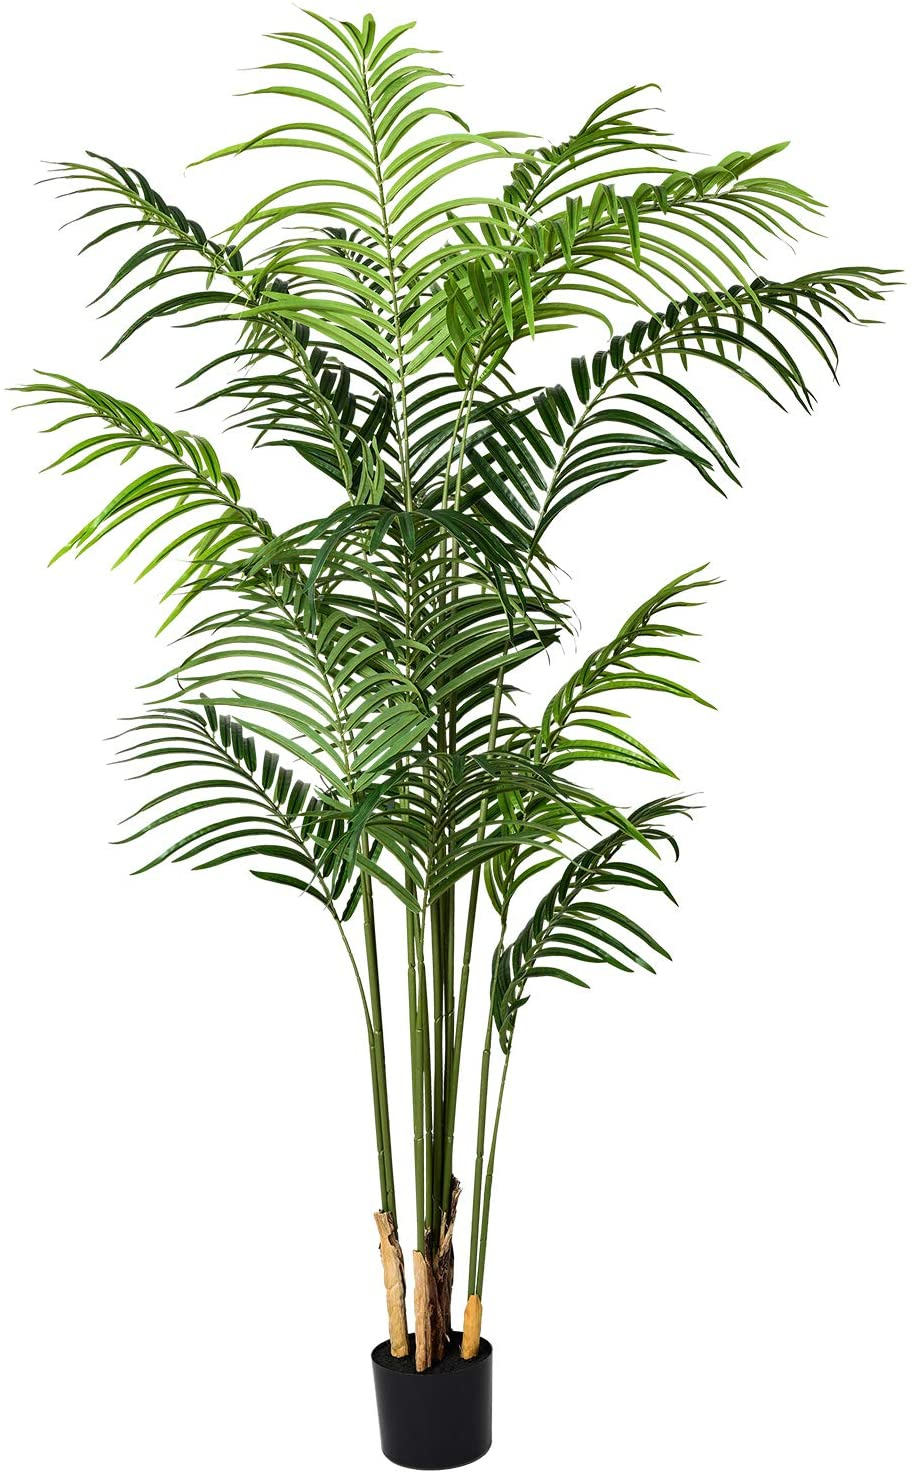 Amazon Com Artiflr 5 5 Feet Artificial Areca Palm Plant Fake Palm Tree With 15 Detachable Trunks Faux Tropical Plan In 2021 Fake Palm Tree Palm Plant Areca Palm Plant